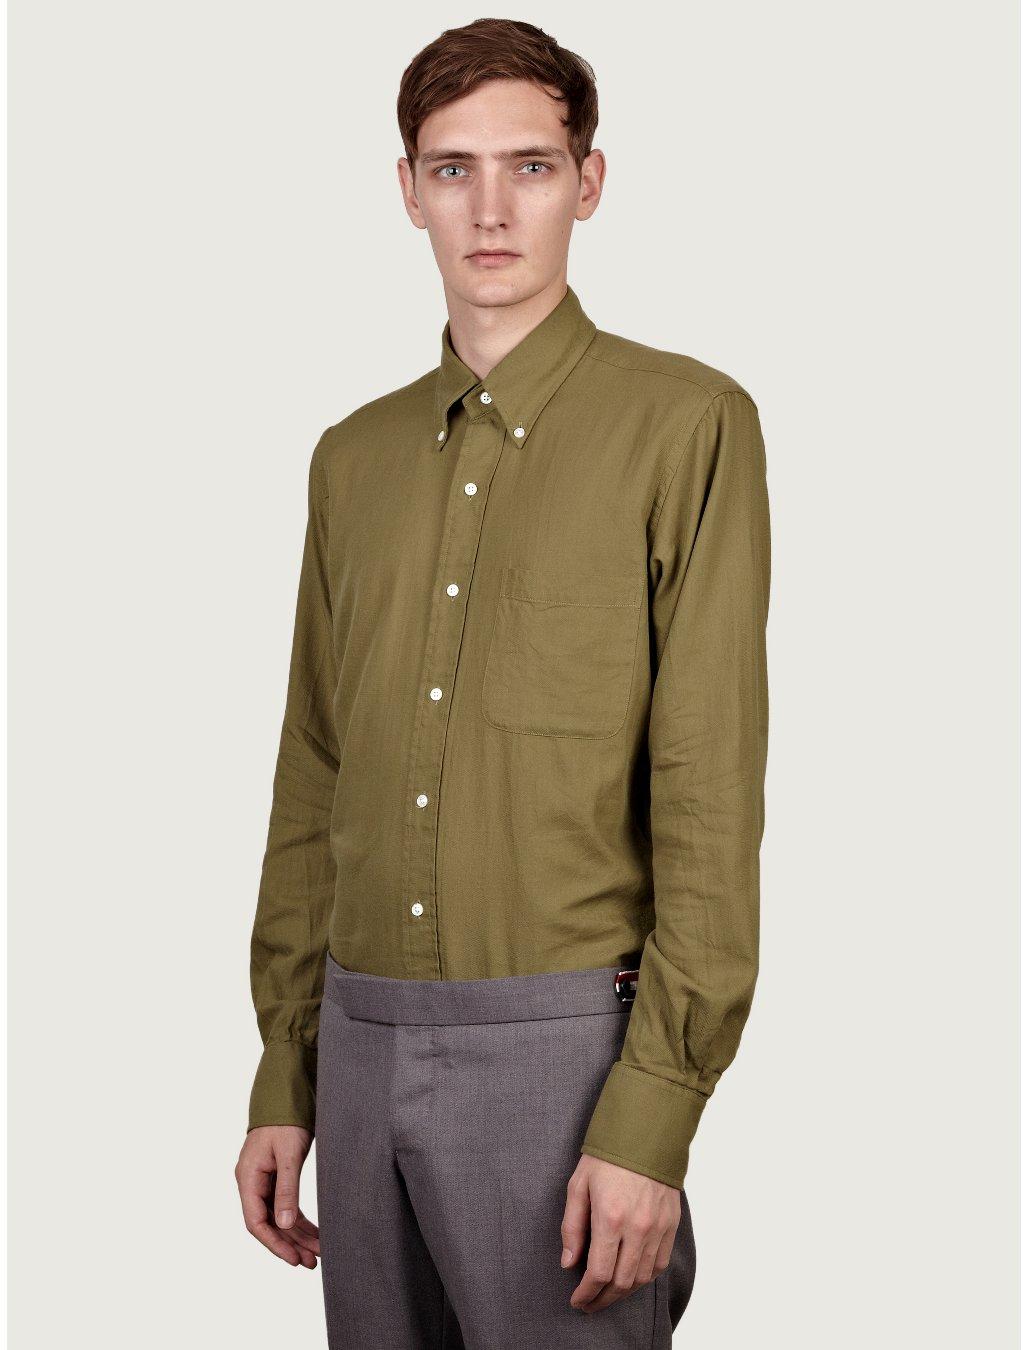 Thom browne mens classic light flannel shirt in green for for Men s lightweight flannel shirts